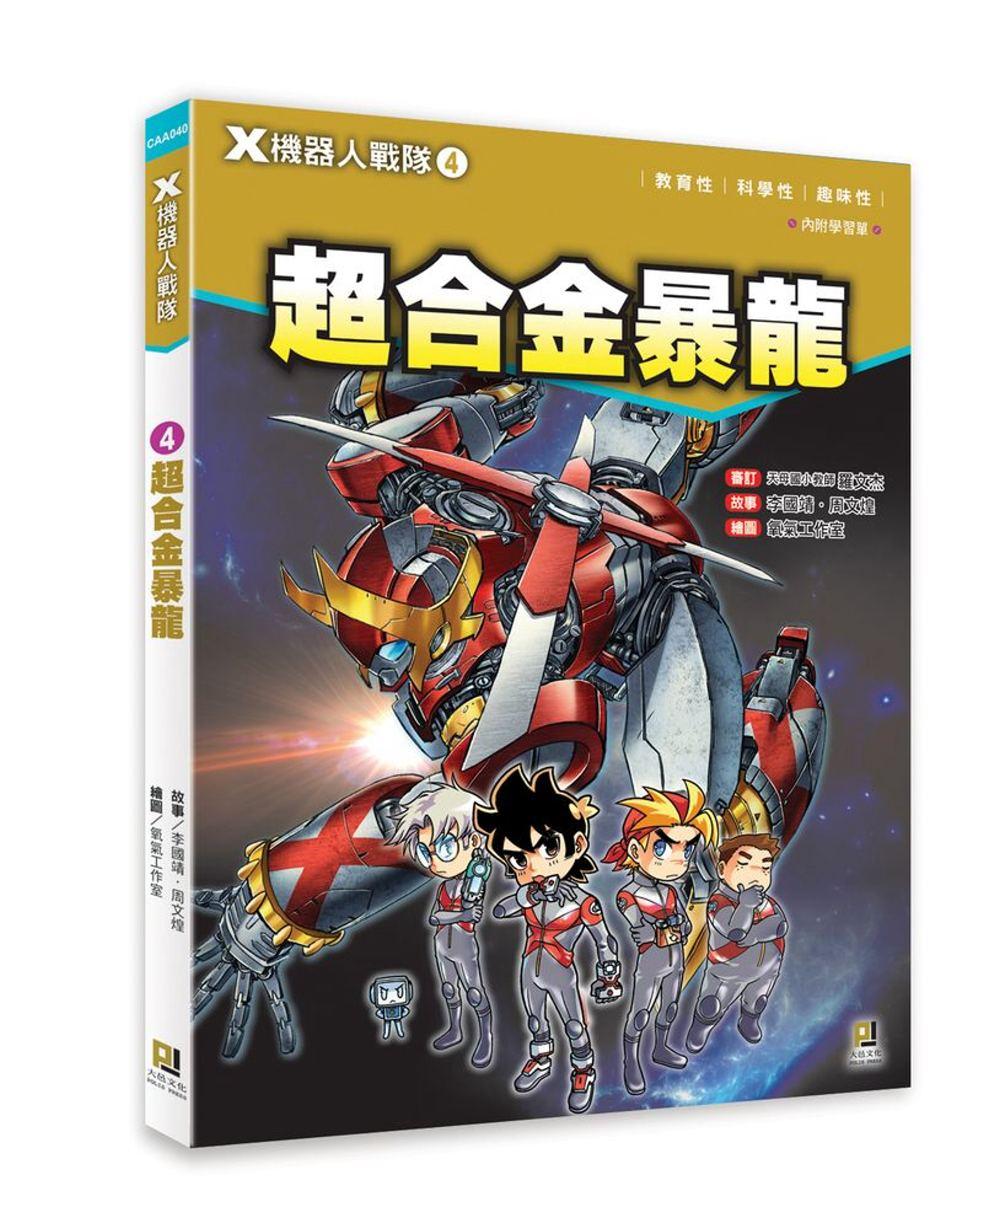 X機器人戰隊 4 超合金暴龍(附學習單)